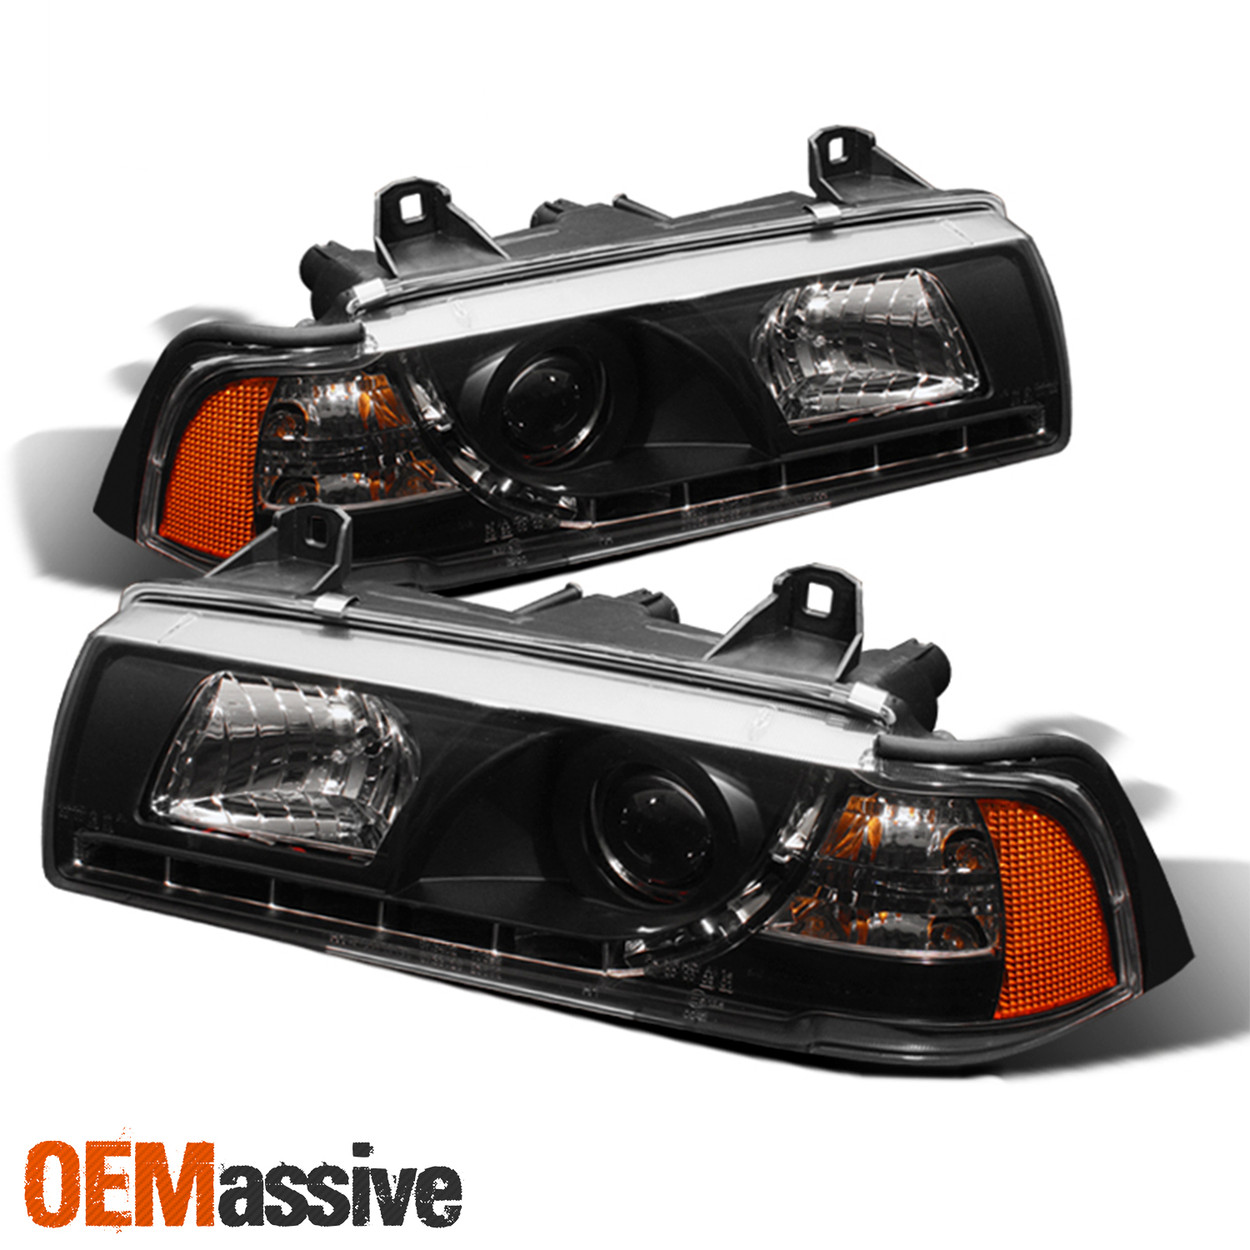 Fit Bmw 92 98 E36 3 Series Projector Headlights Drl Corner Lights Black Oemassive